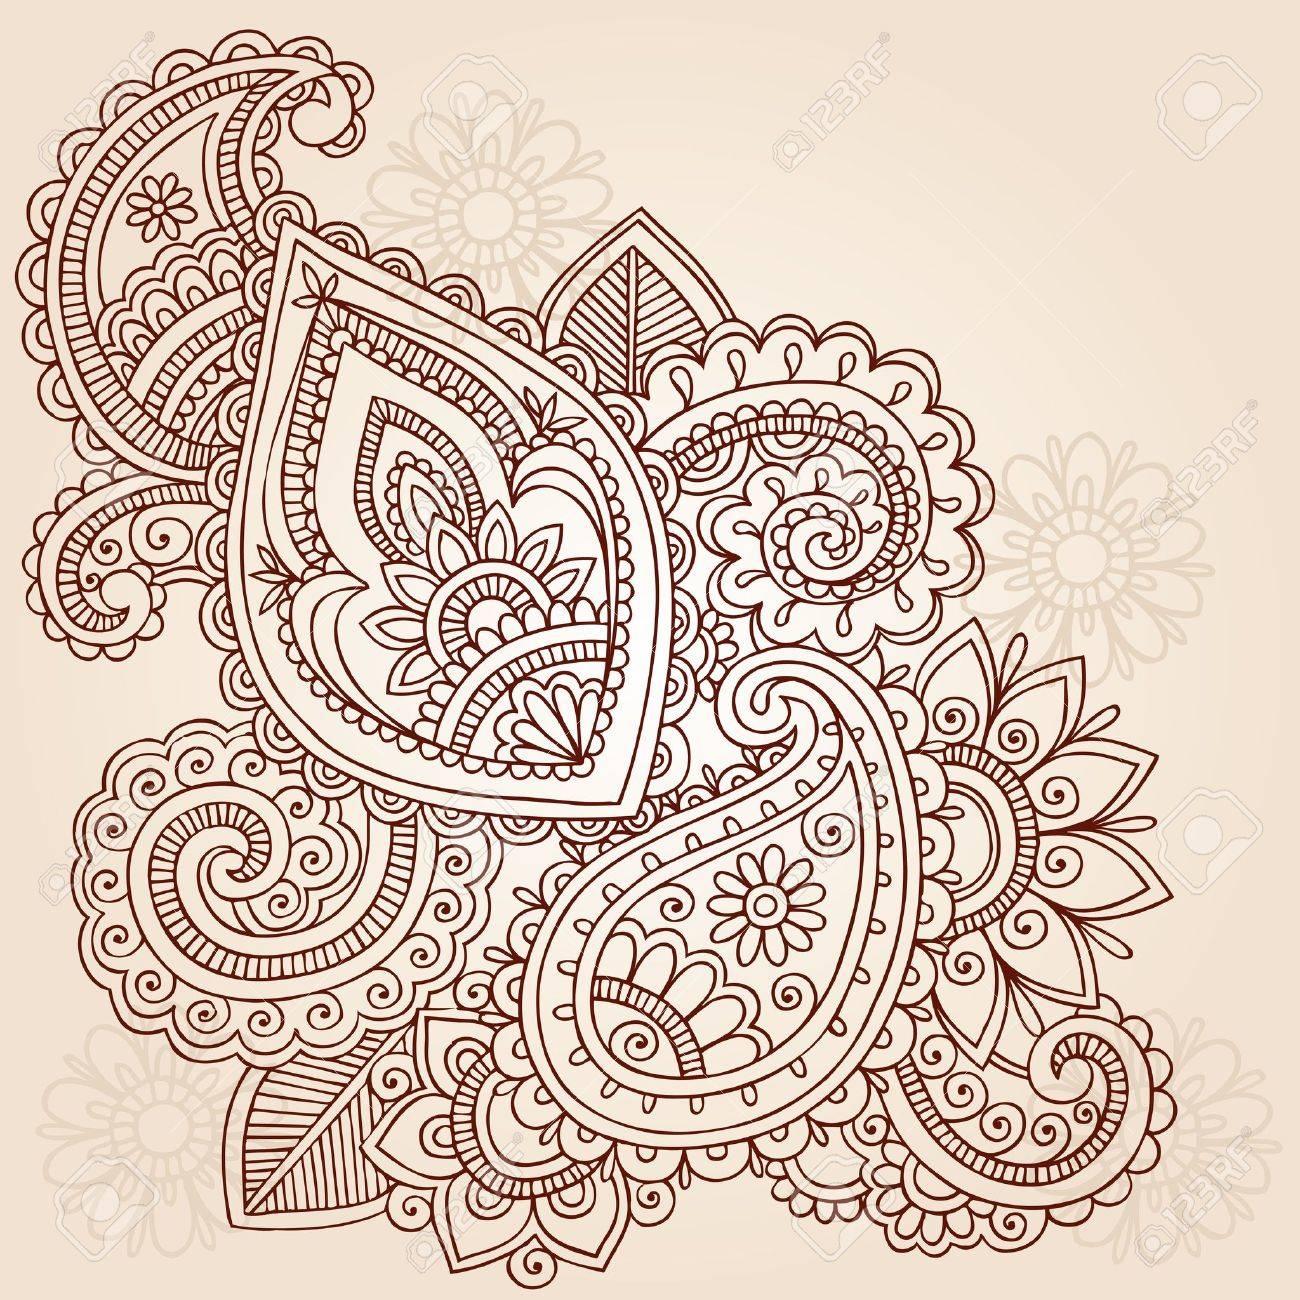 Abstract Henna Mehndi Paisley Hand-Drawn Doodle Vector Illustration Design Elements Stock Vector - 11553504